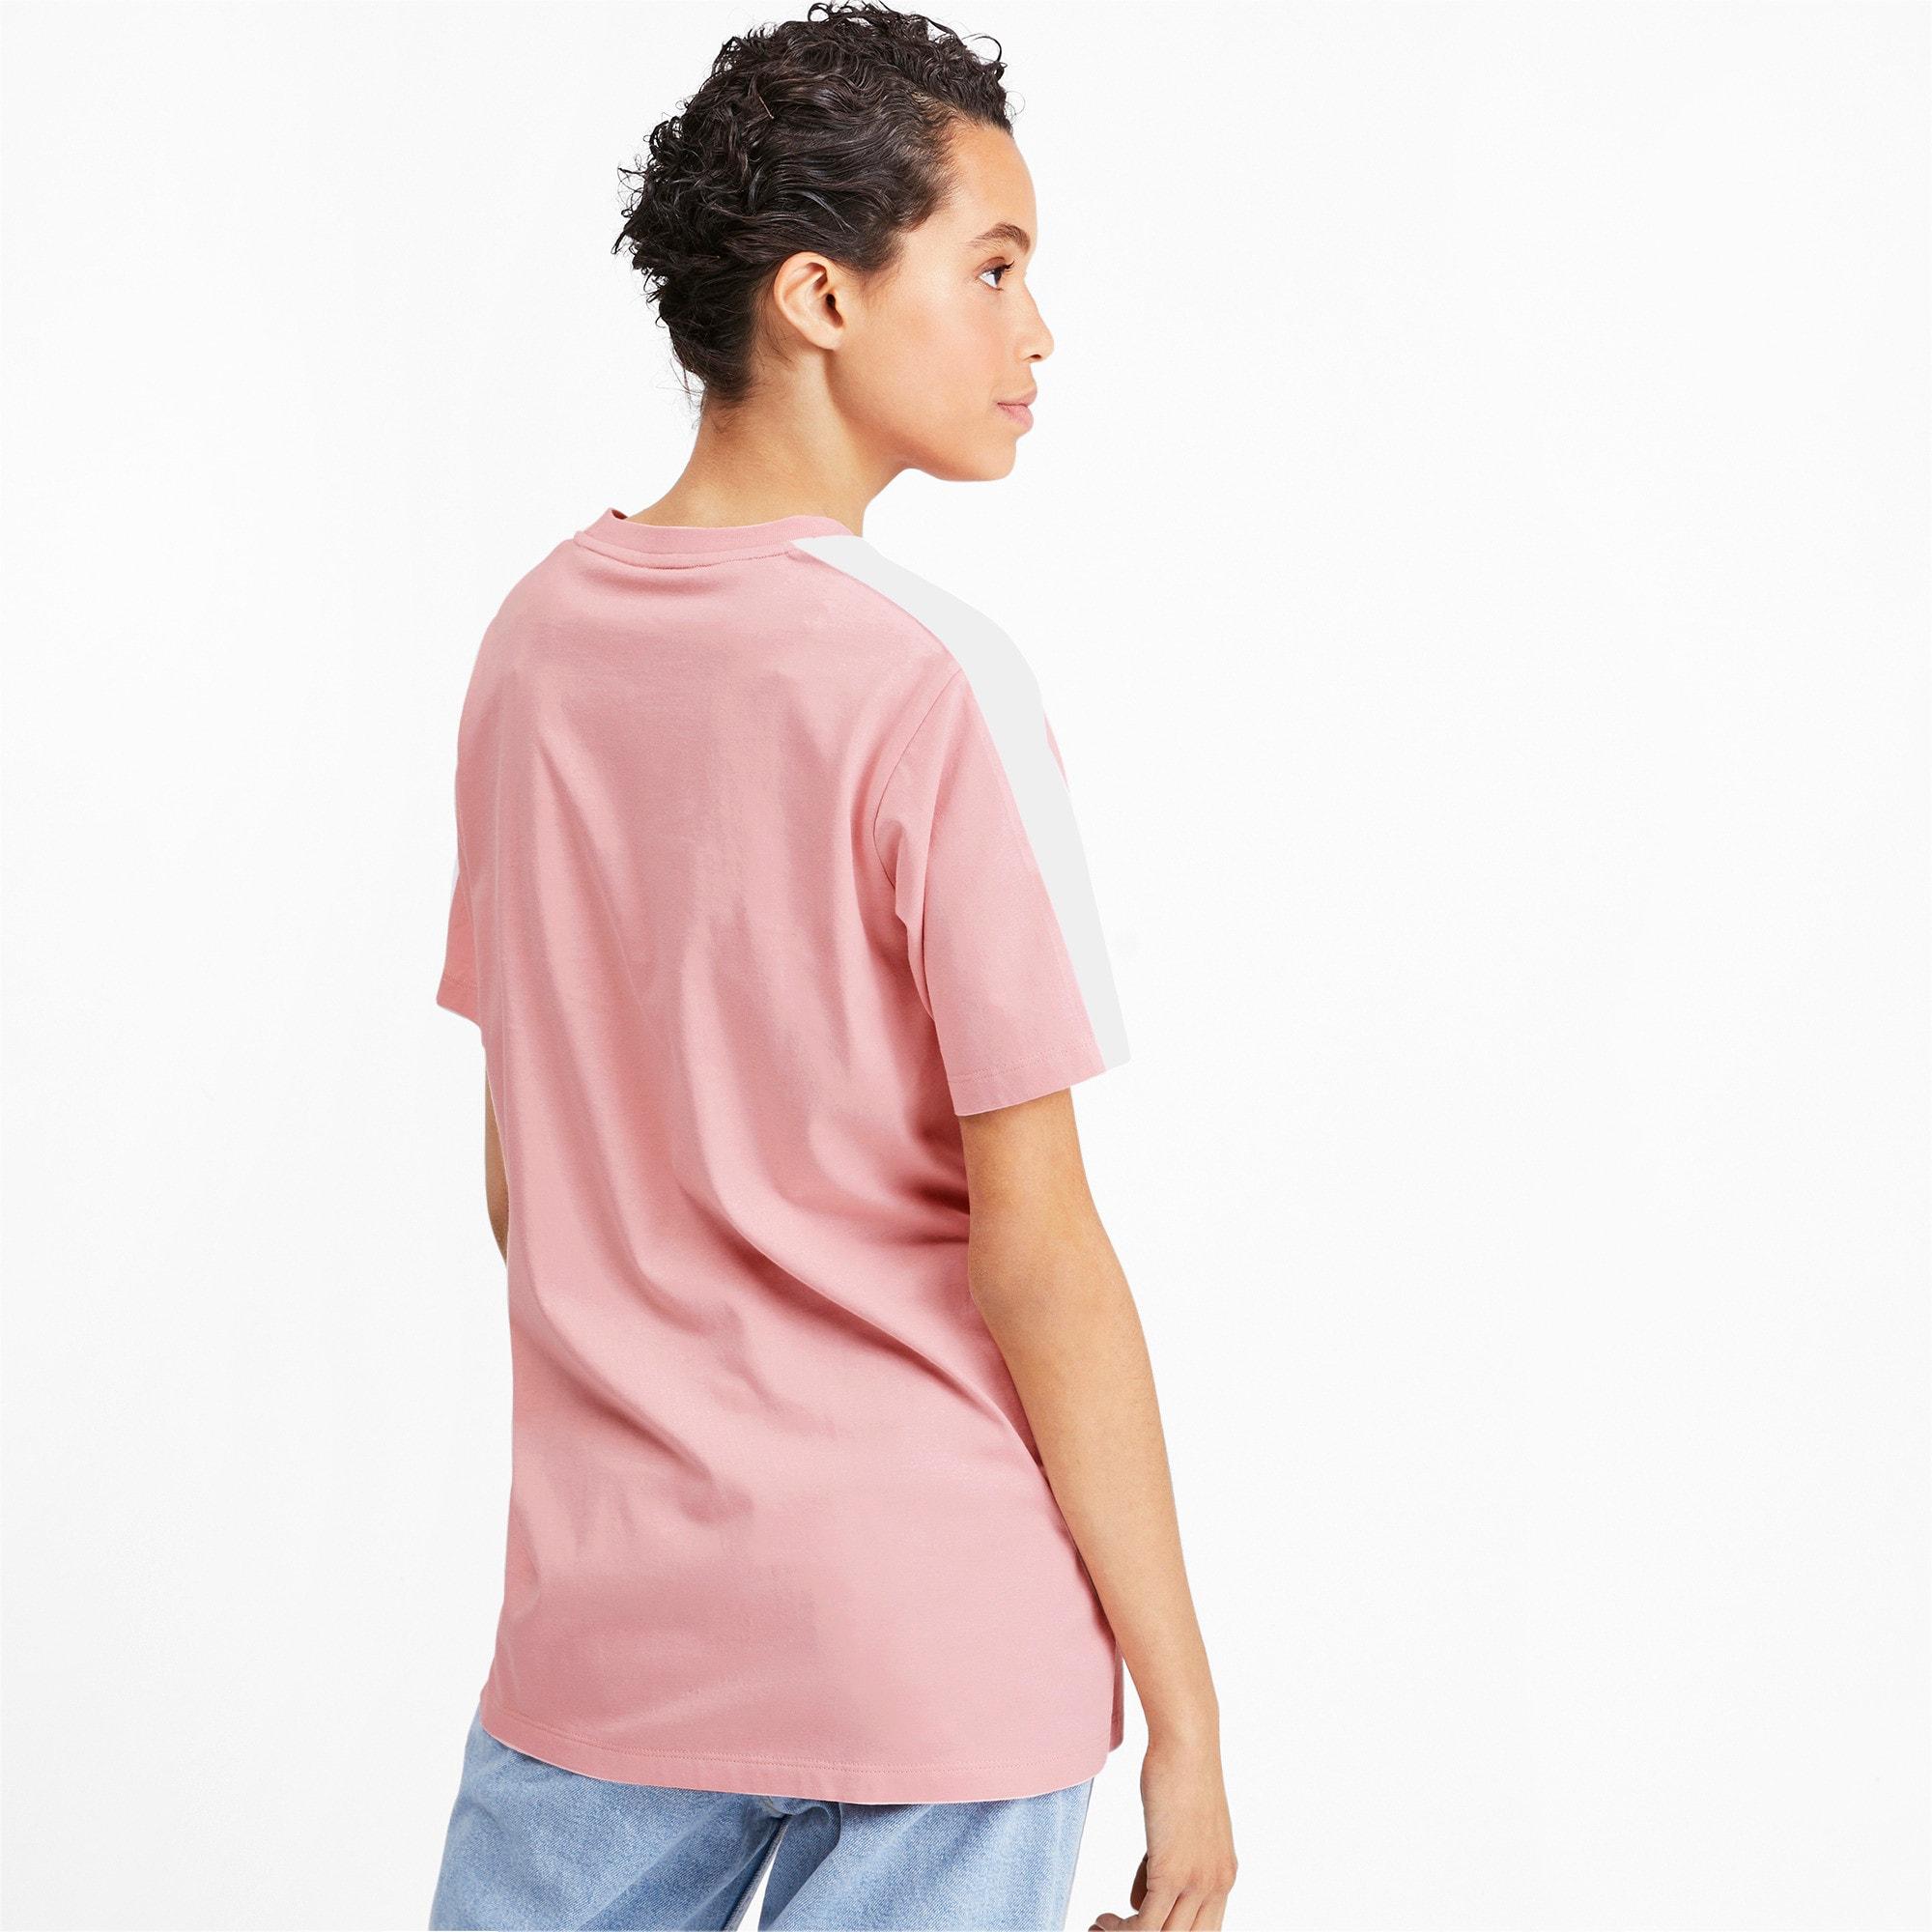 Miniatura 2 de Camiseta Classics T7 para mujer, Bridal Rose, mediano